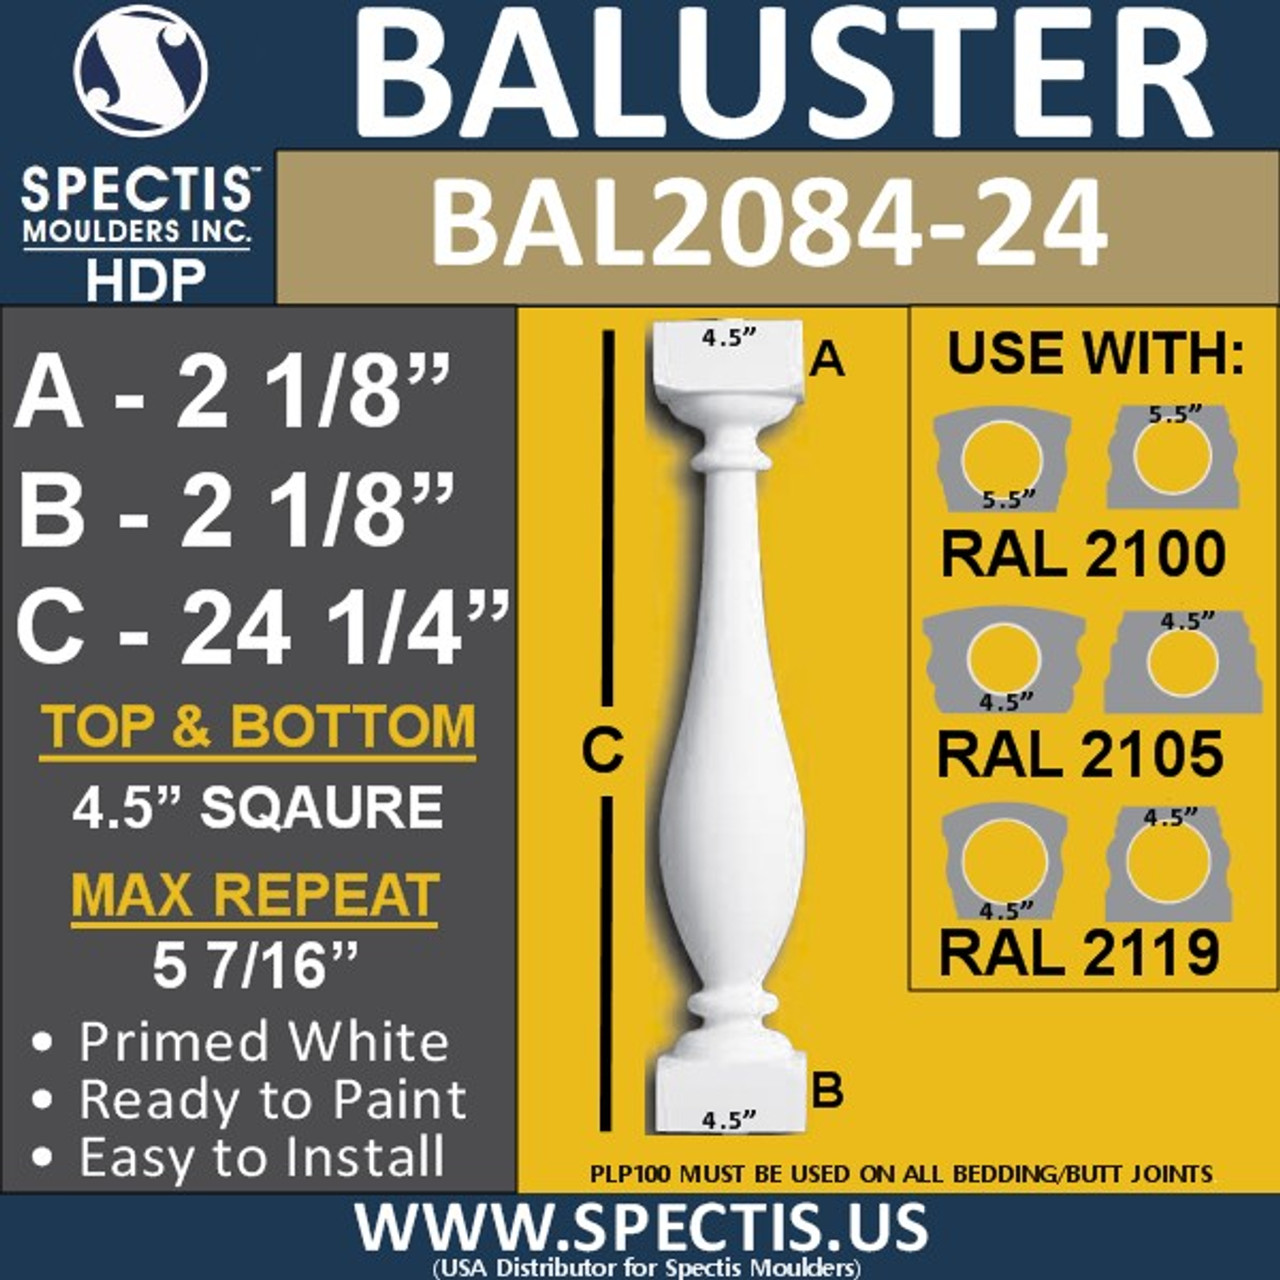 "BAL2084-24 Spectis Urethane Railing Baluster 4 1/2"" x 24 1/4"""